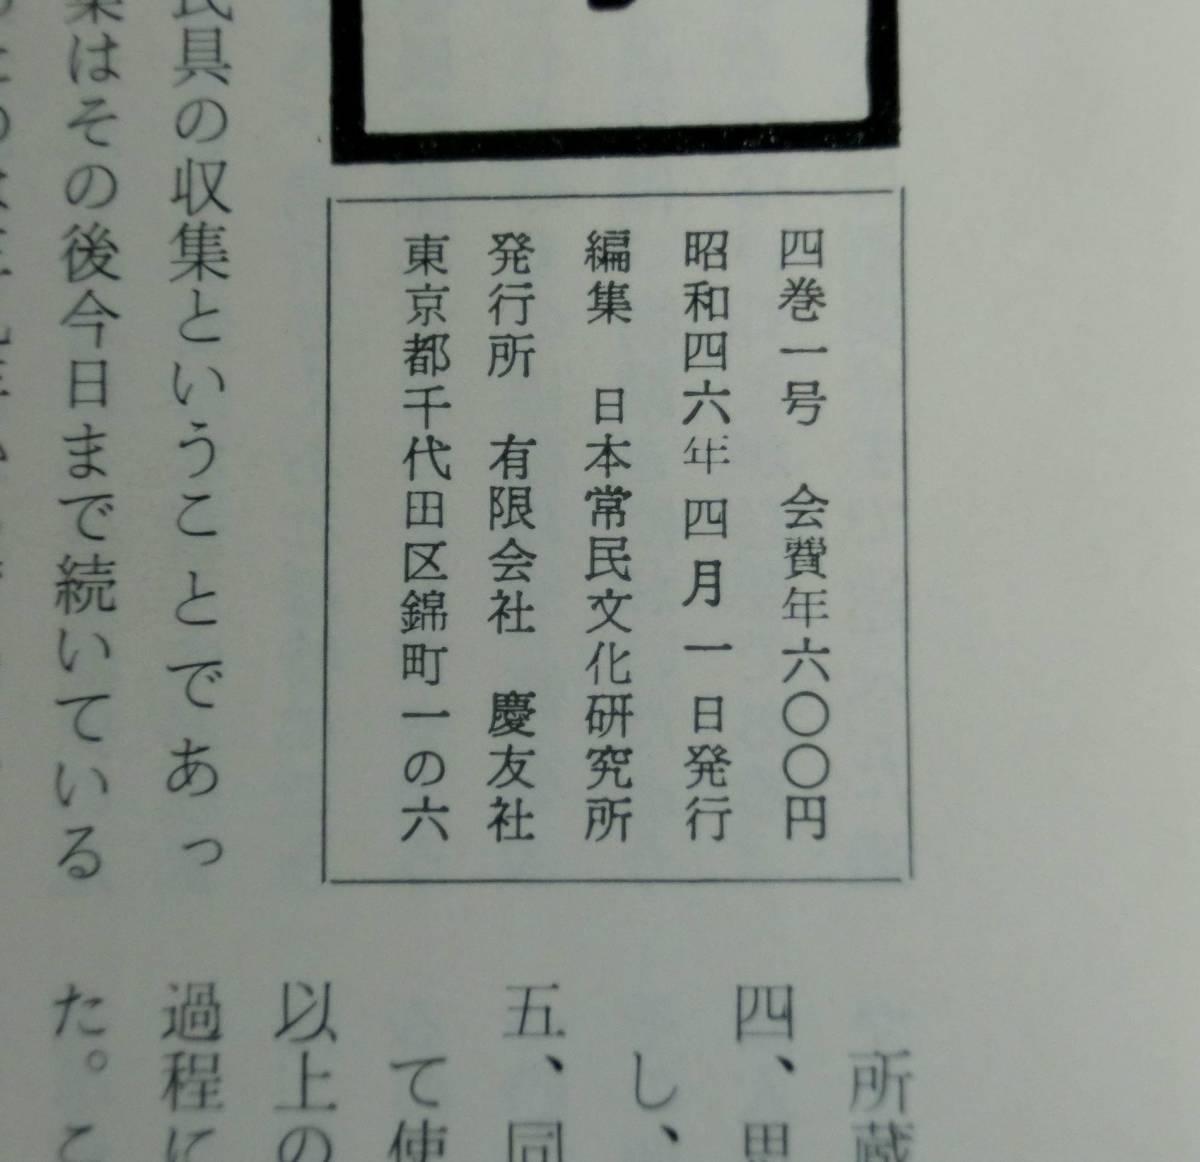 #kp0 ◆稀本◆◇ 【 「 民具マンスリー 」4巻1号~4巻12号 】◇◆ 日本常民文化研究所 昭和46年 _画像3